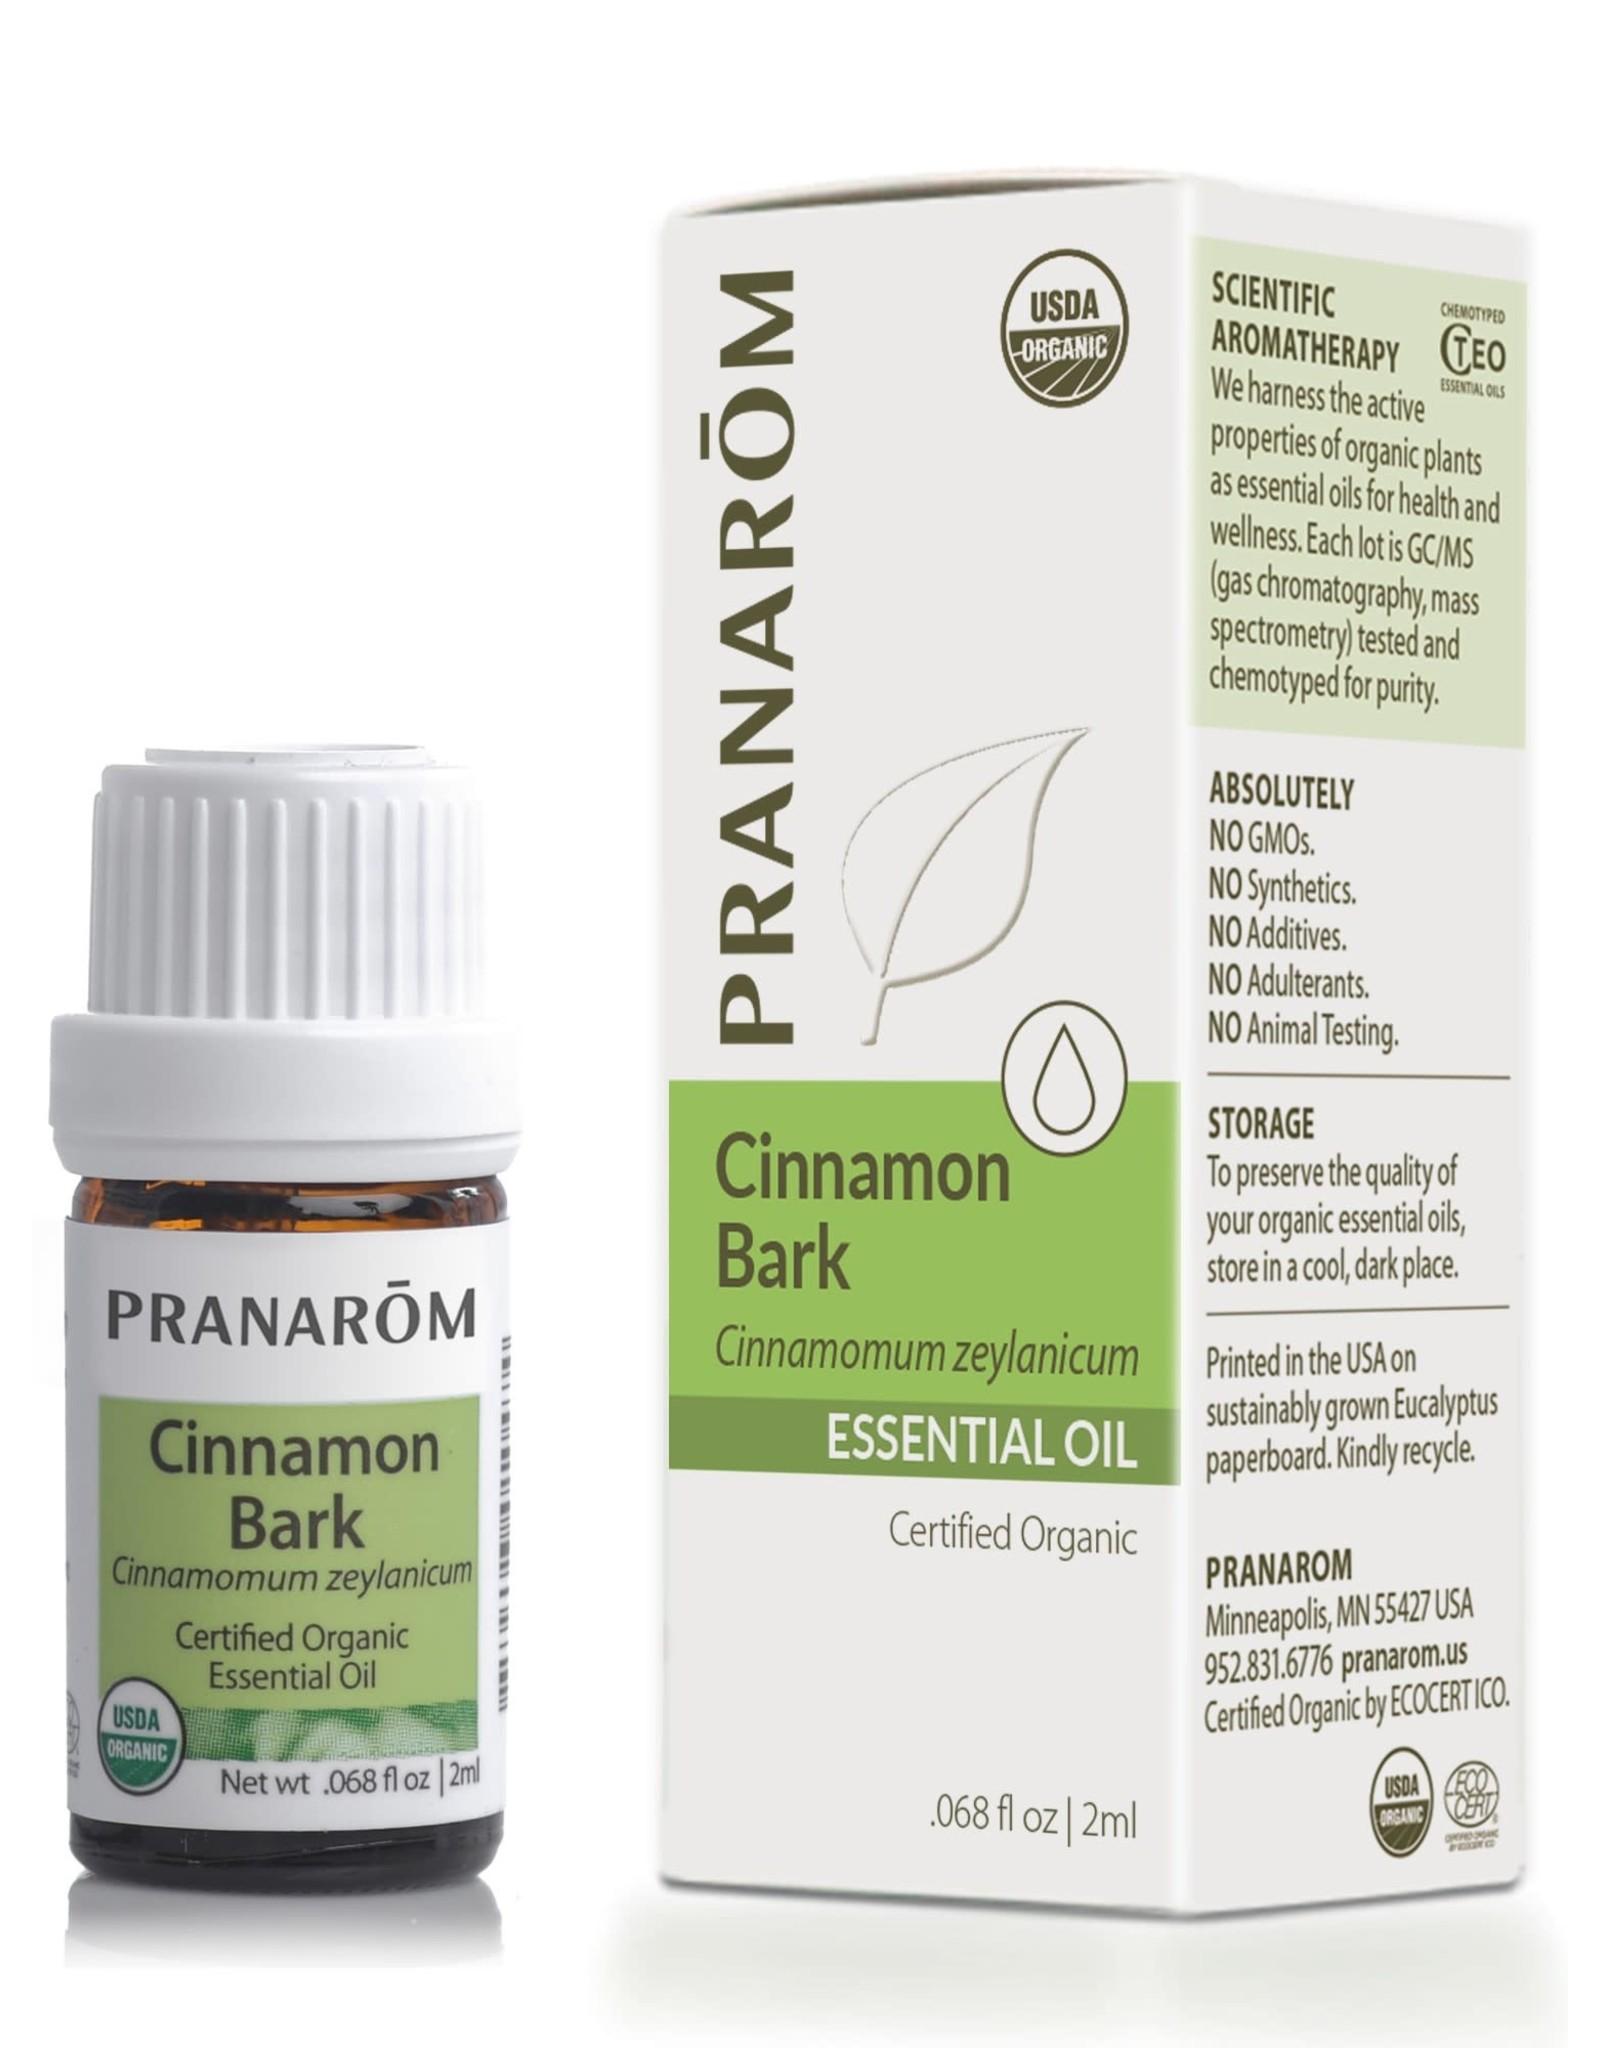 Cinnamon Bark Oil, 2ml